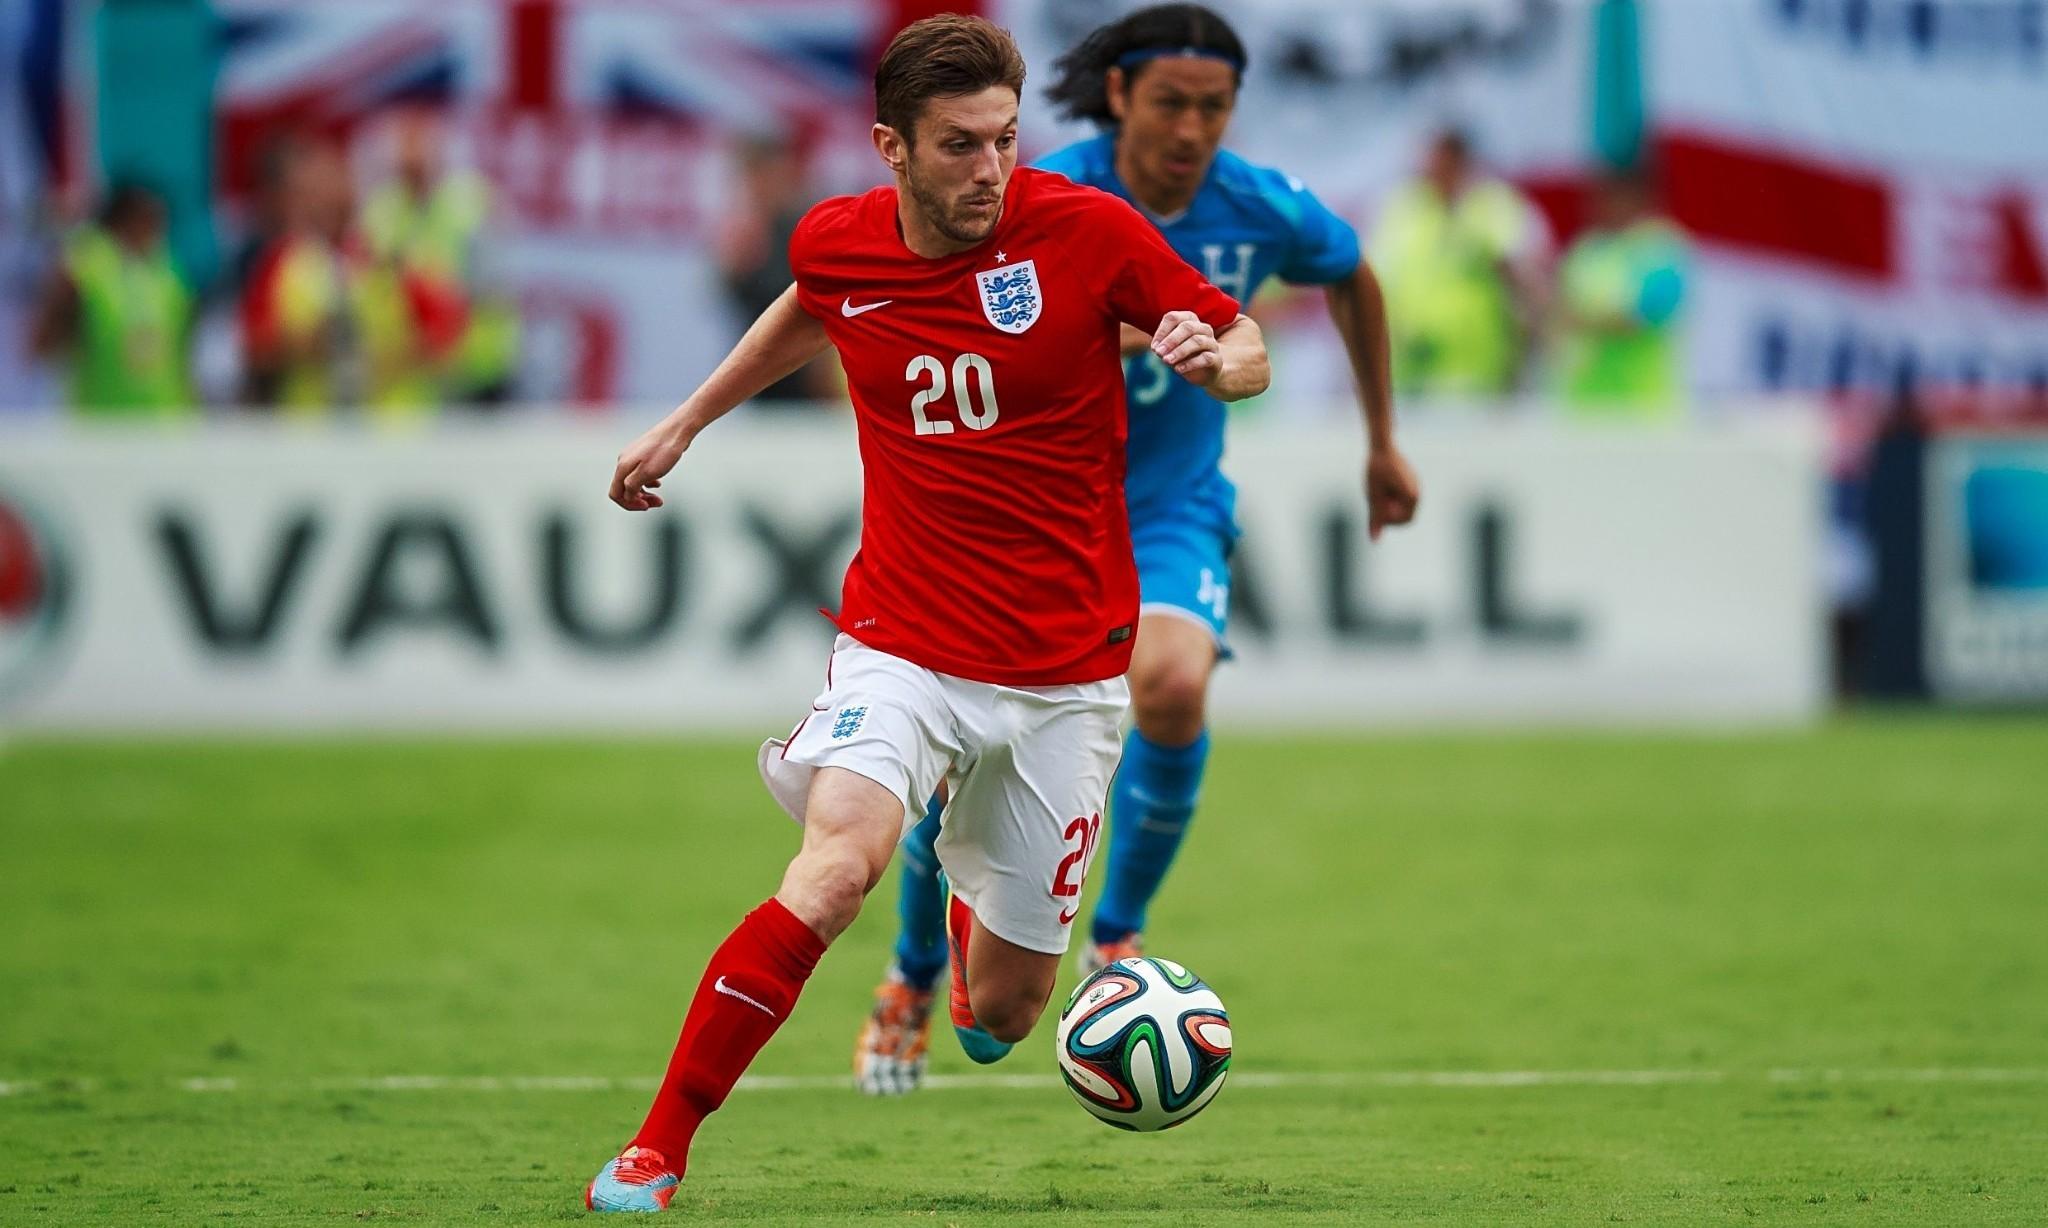 Liverpool's Adam Lallana set to miss start of season with knee injury